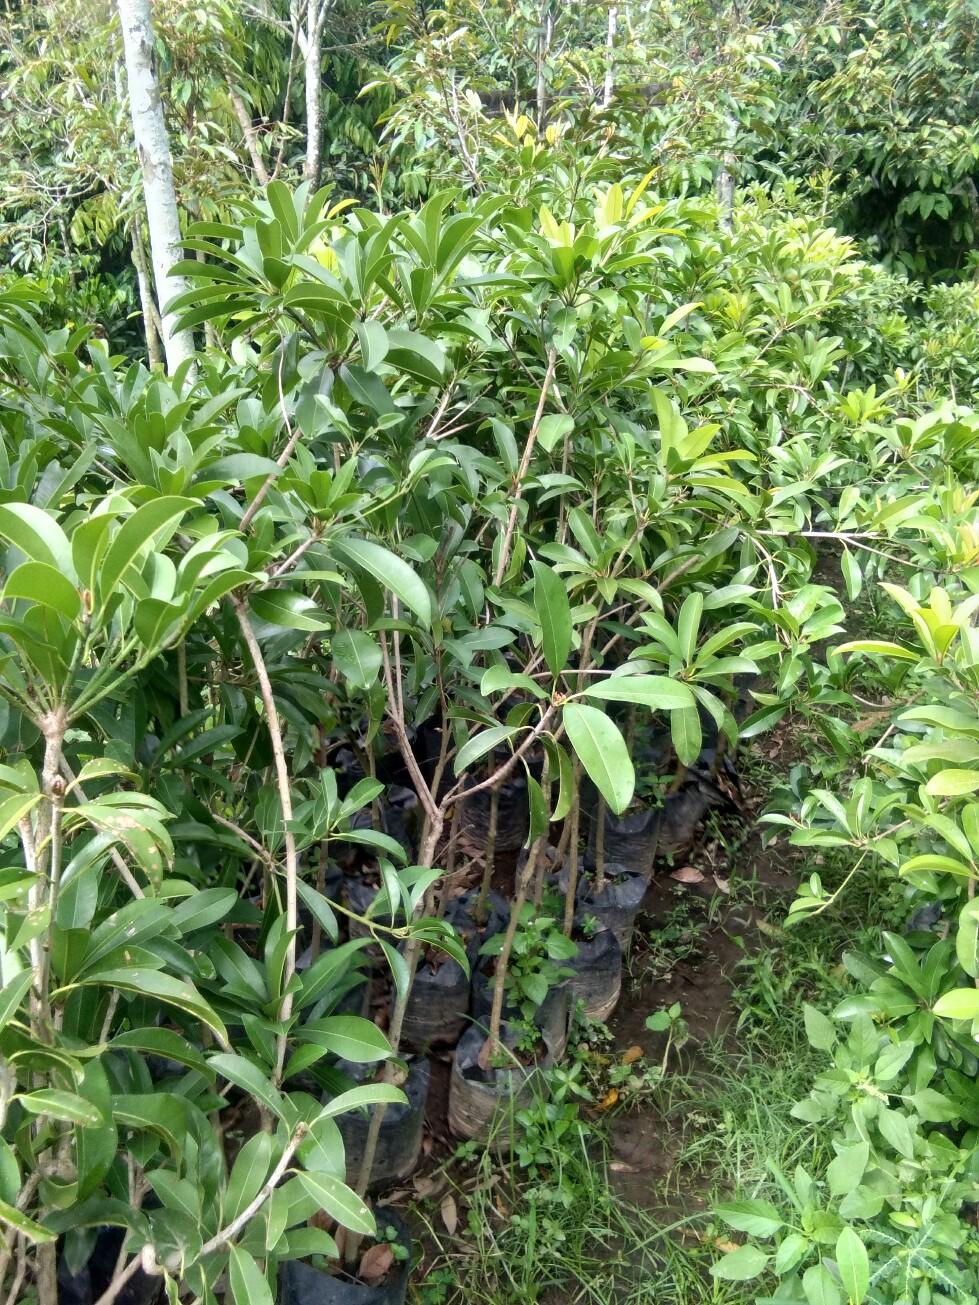 Jual bibit tanaman buah sawo bali